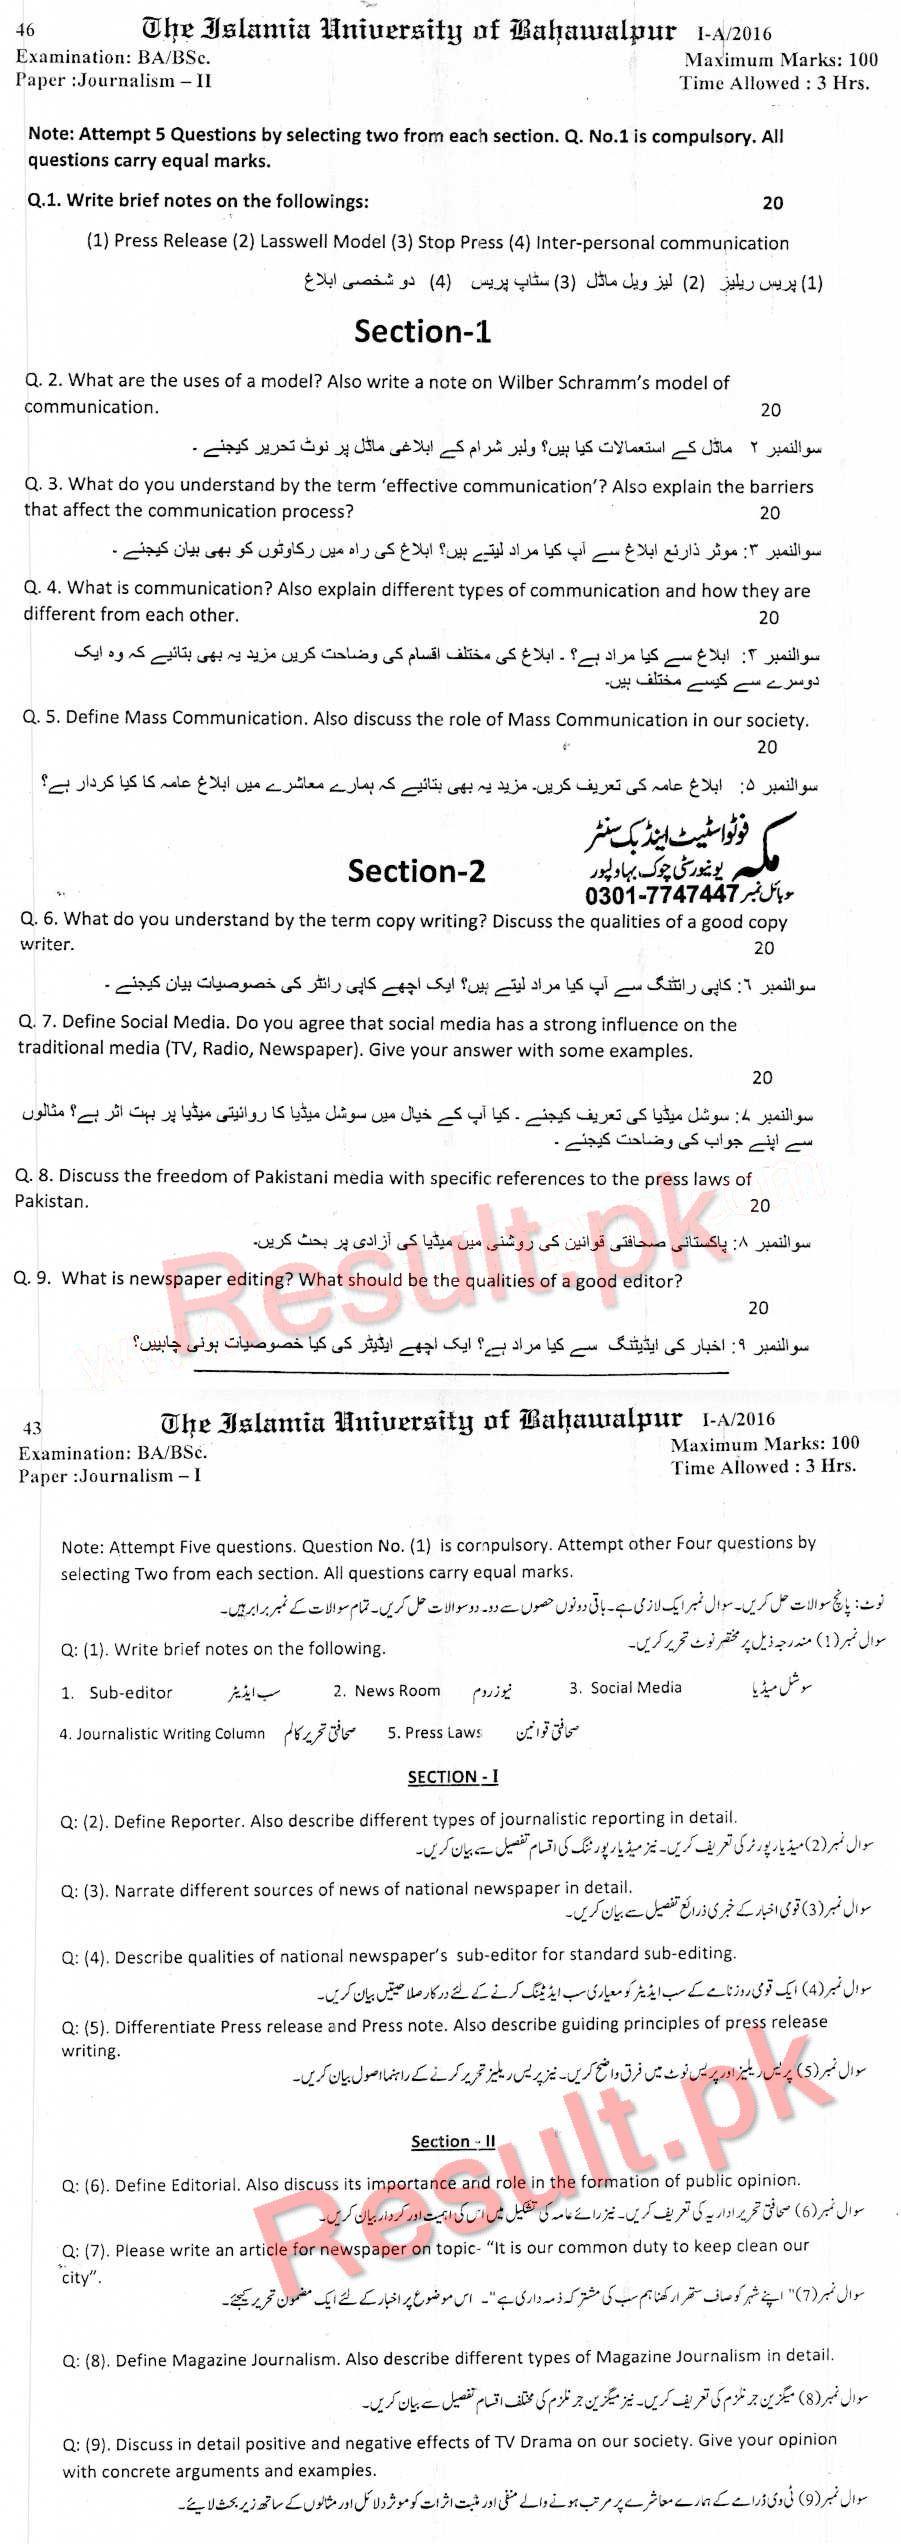 Islamia University Bahawalpur Past Papers 2018, 2017, 2016